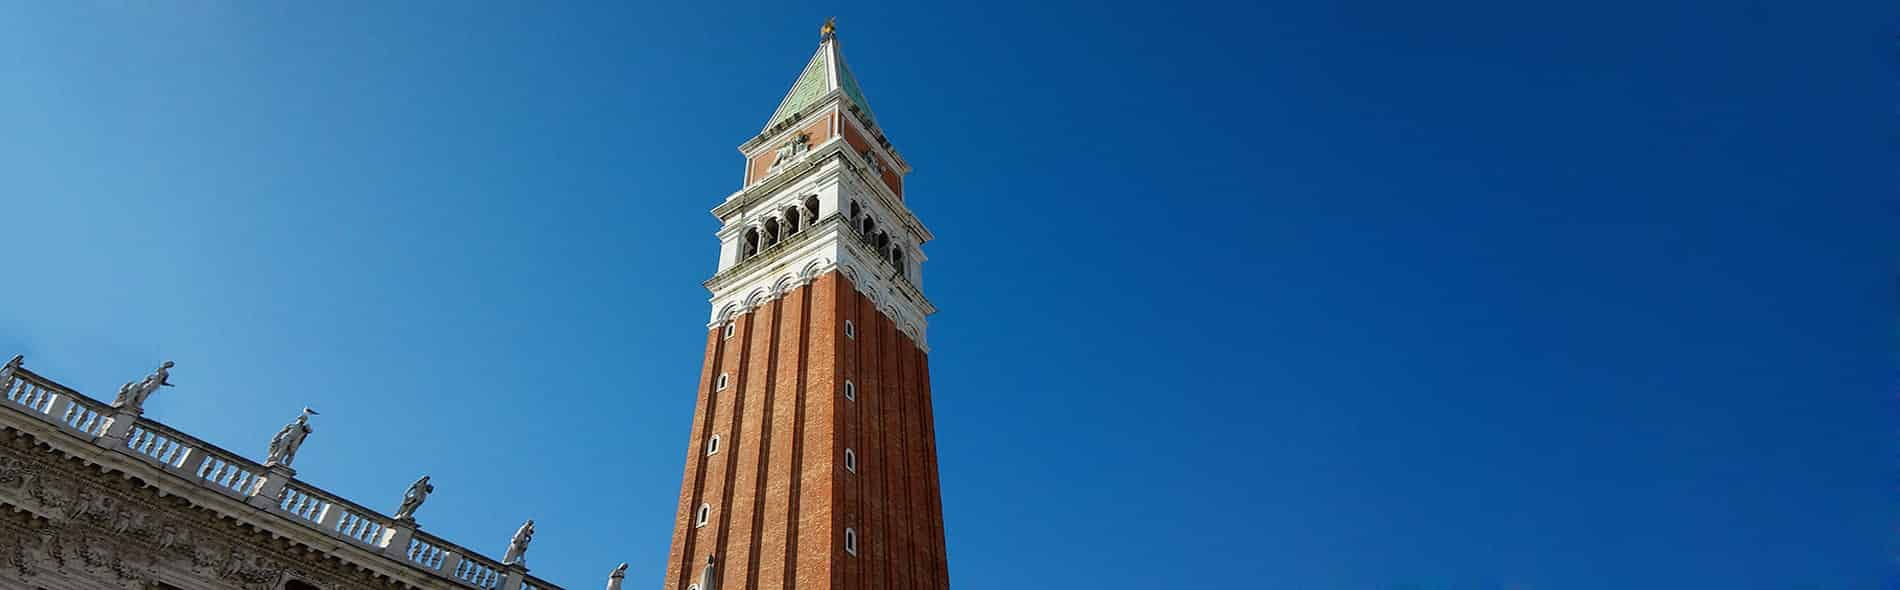 Guided tour in Basilica di San Marco